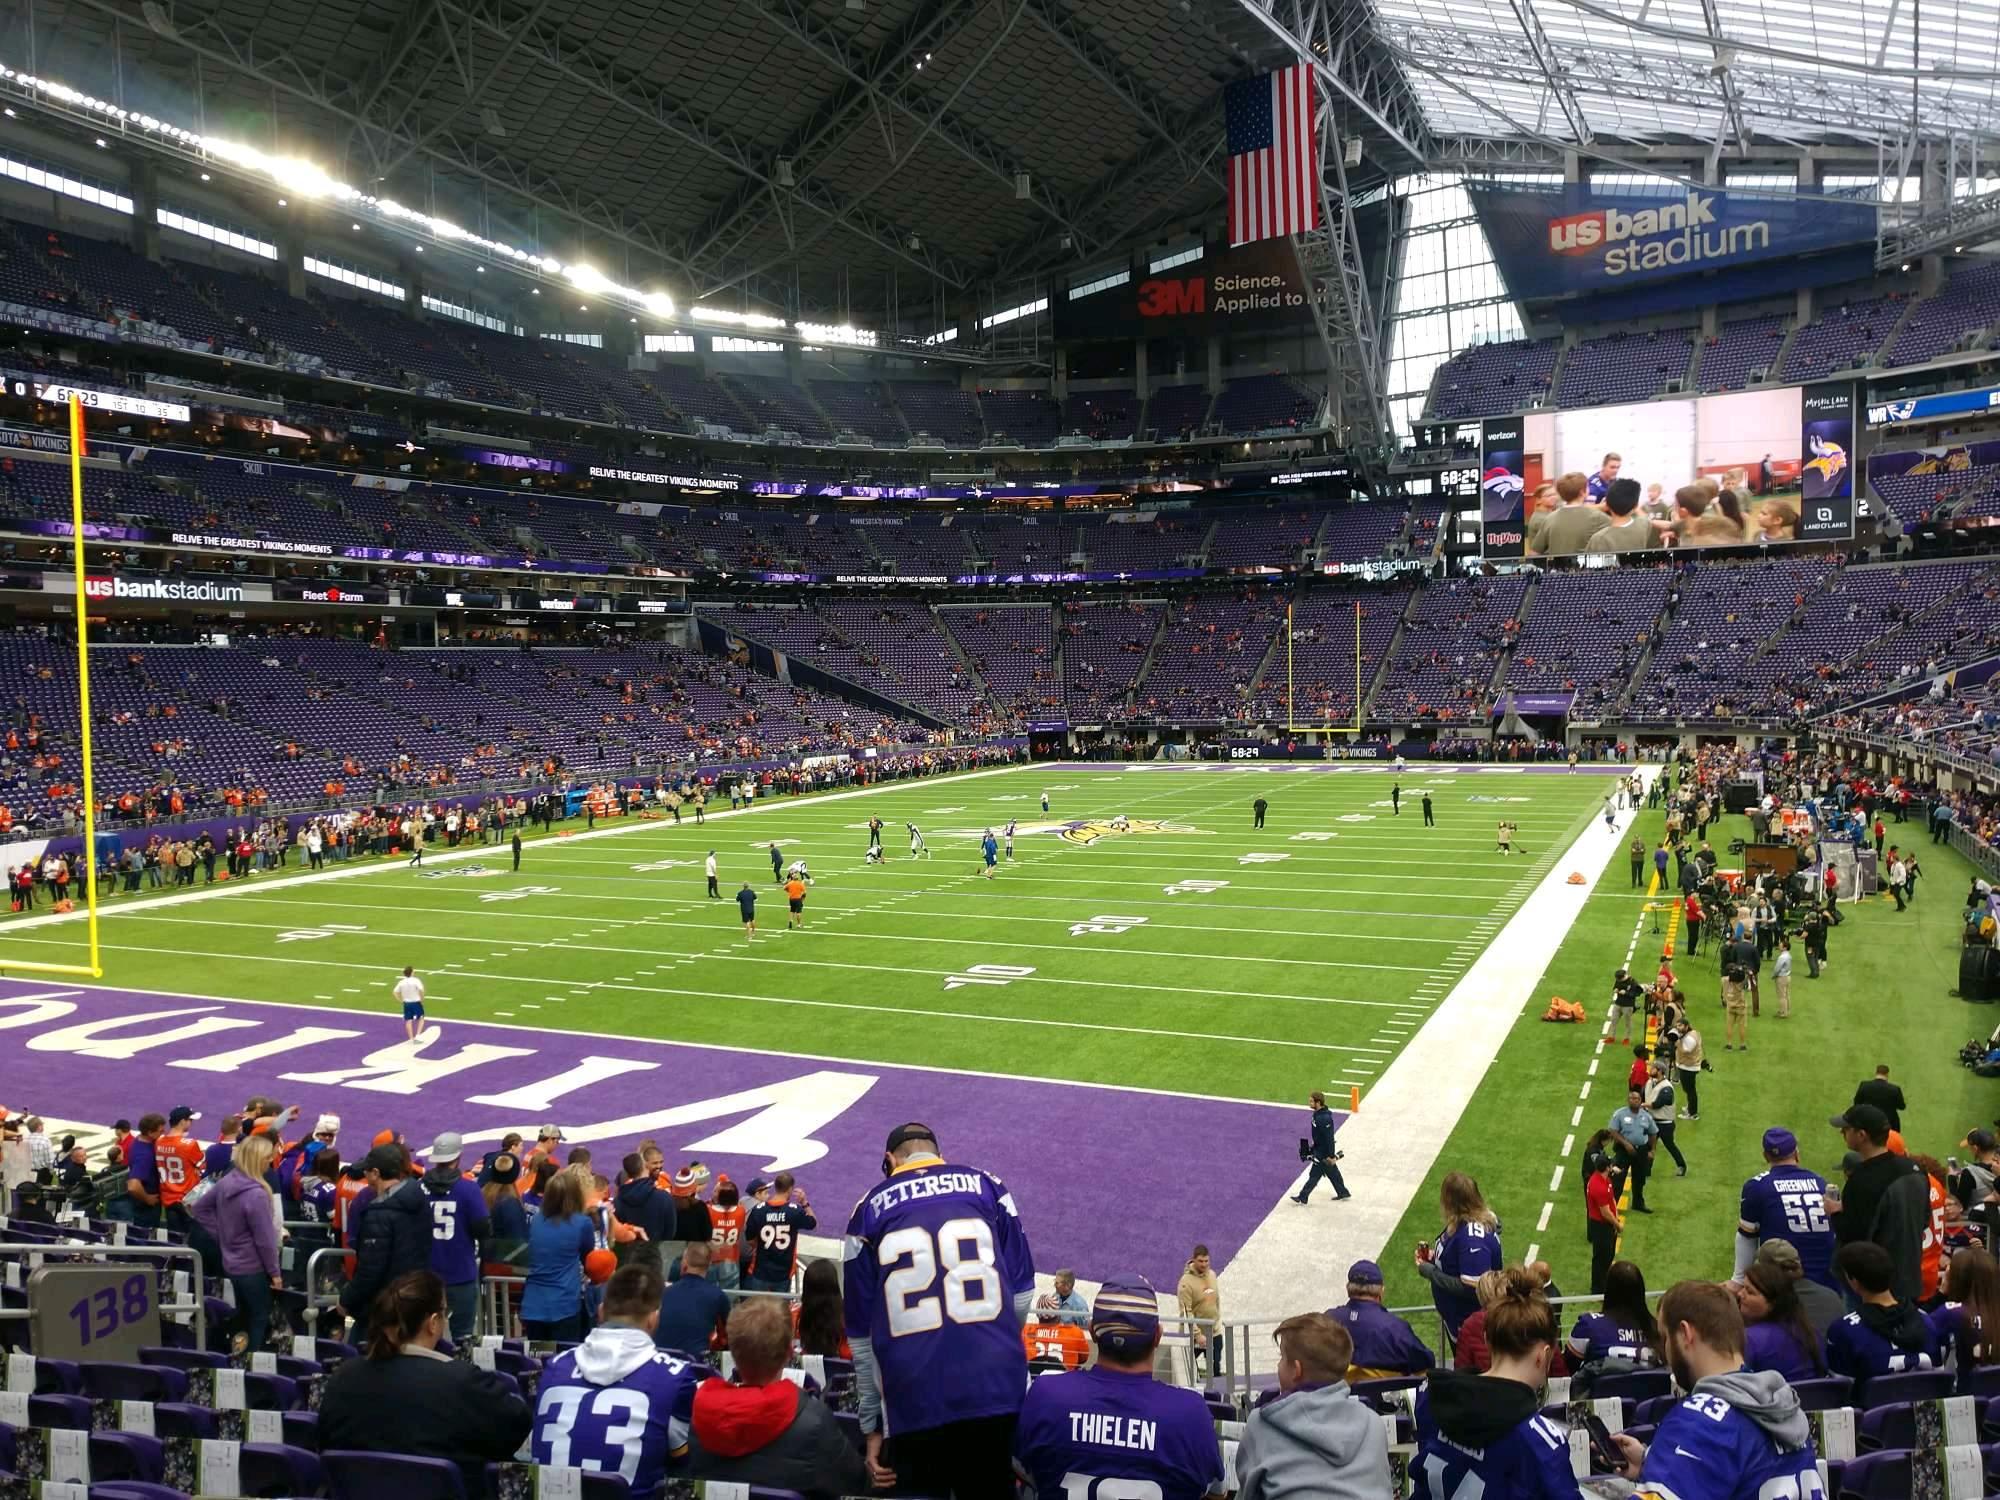 U.S. Bank Stadium Section 138 Row 16 Seat 18